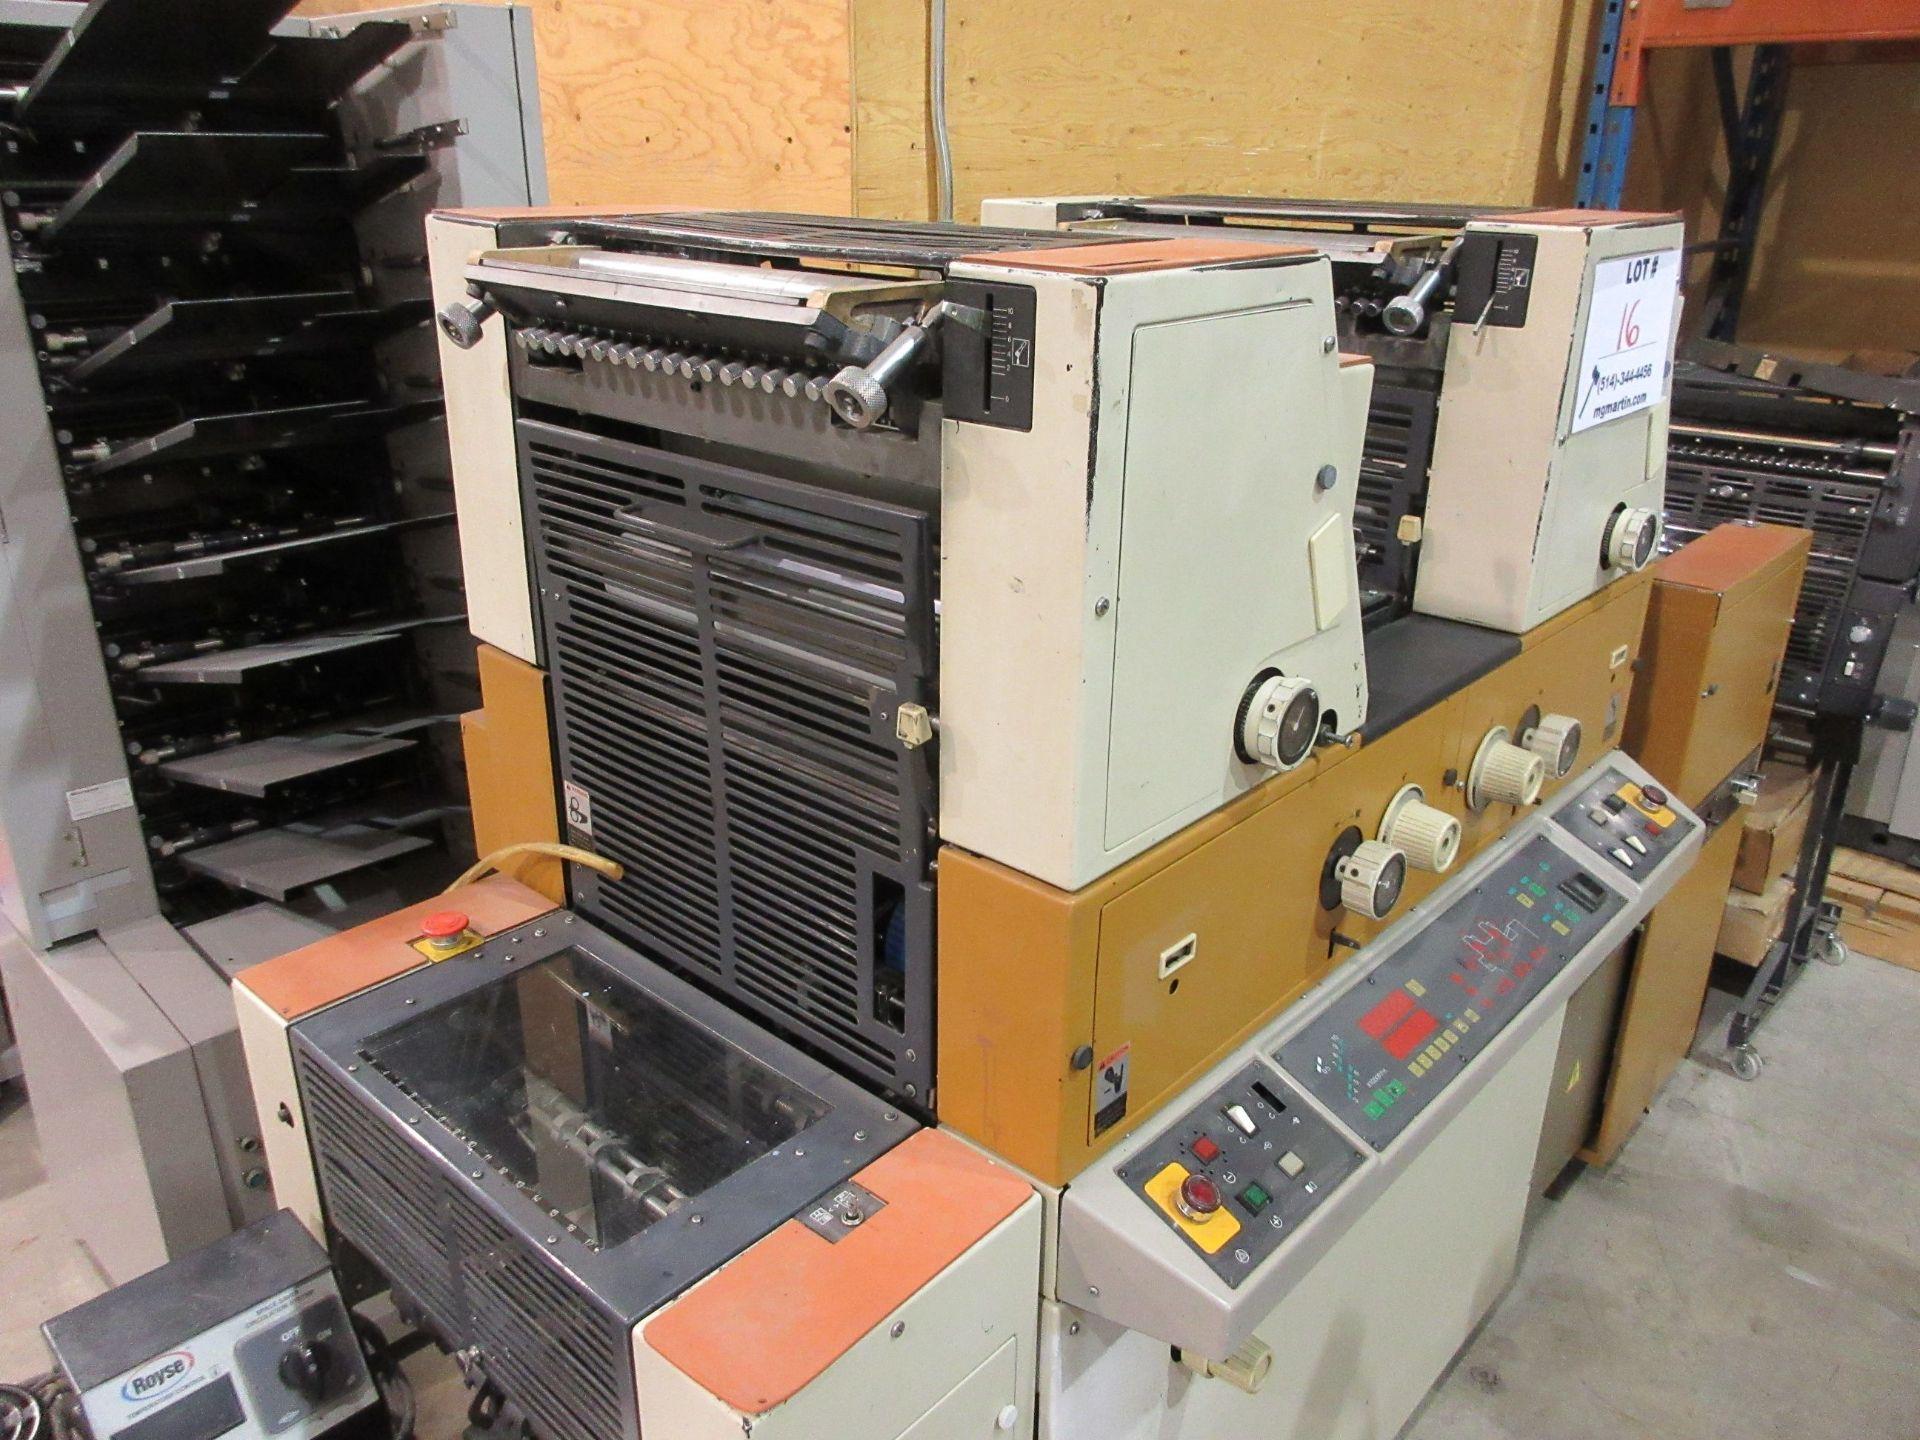 RYOBI ITEK 3985 TRUE (2) color offset press c/w ROYCE chiller - Image 8 of 8